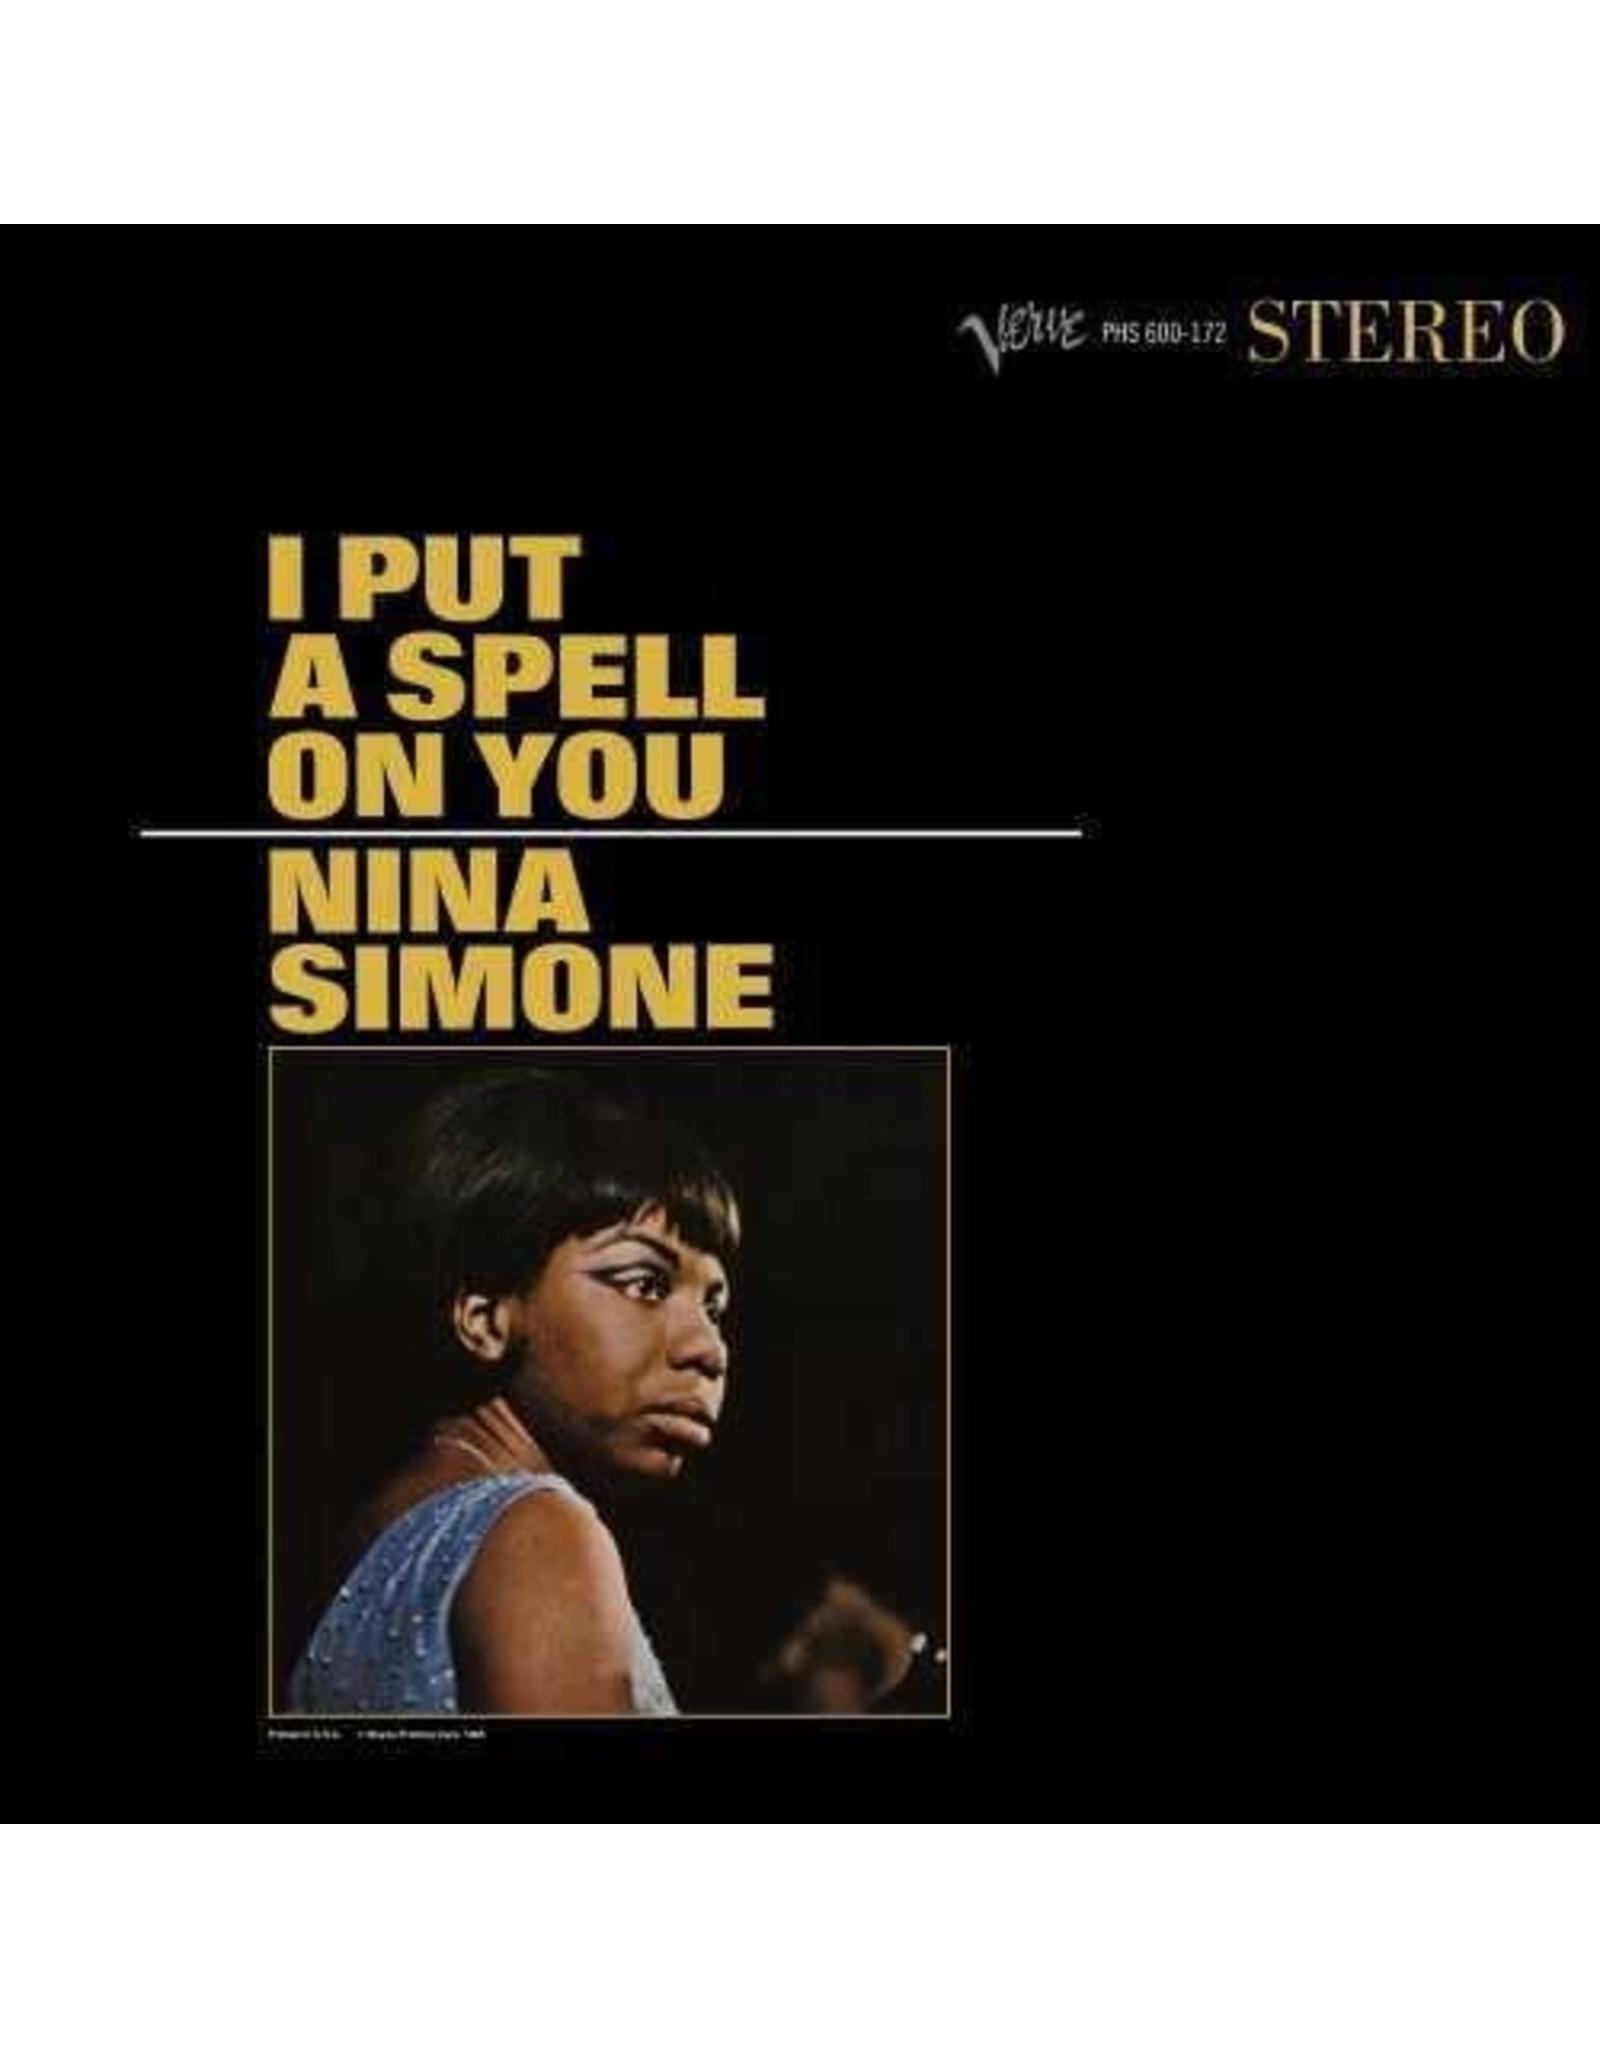 Simone, Nina / I Put A Spell On You (180g)